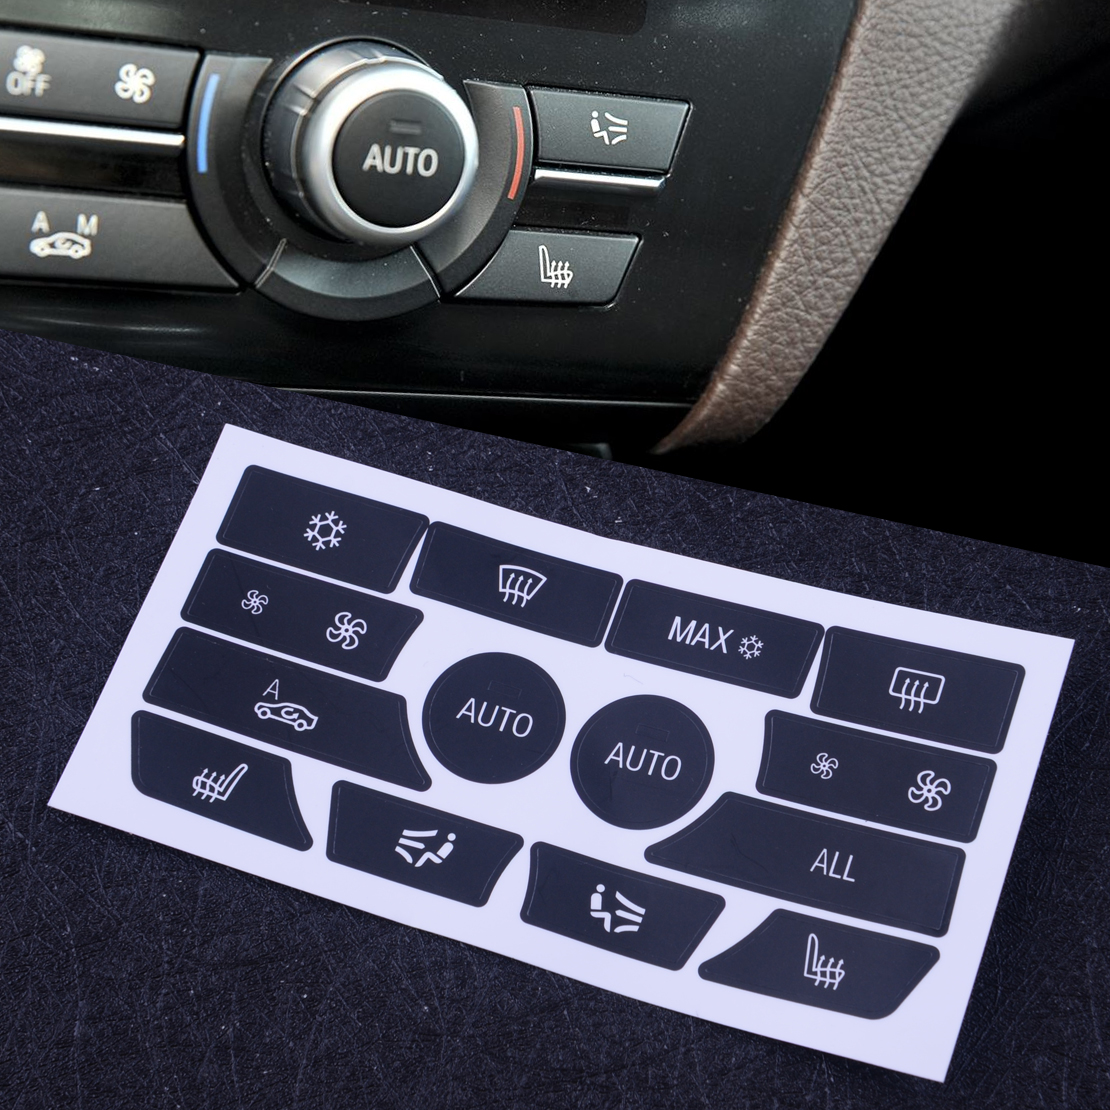 DWCX AC Dash Climate Control Panel Button Repair Sticker